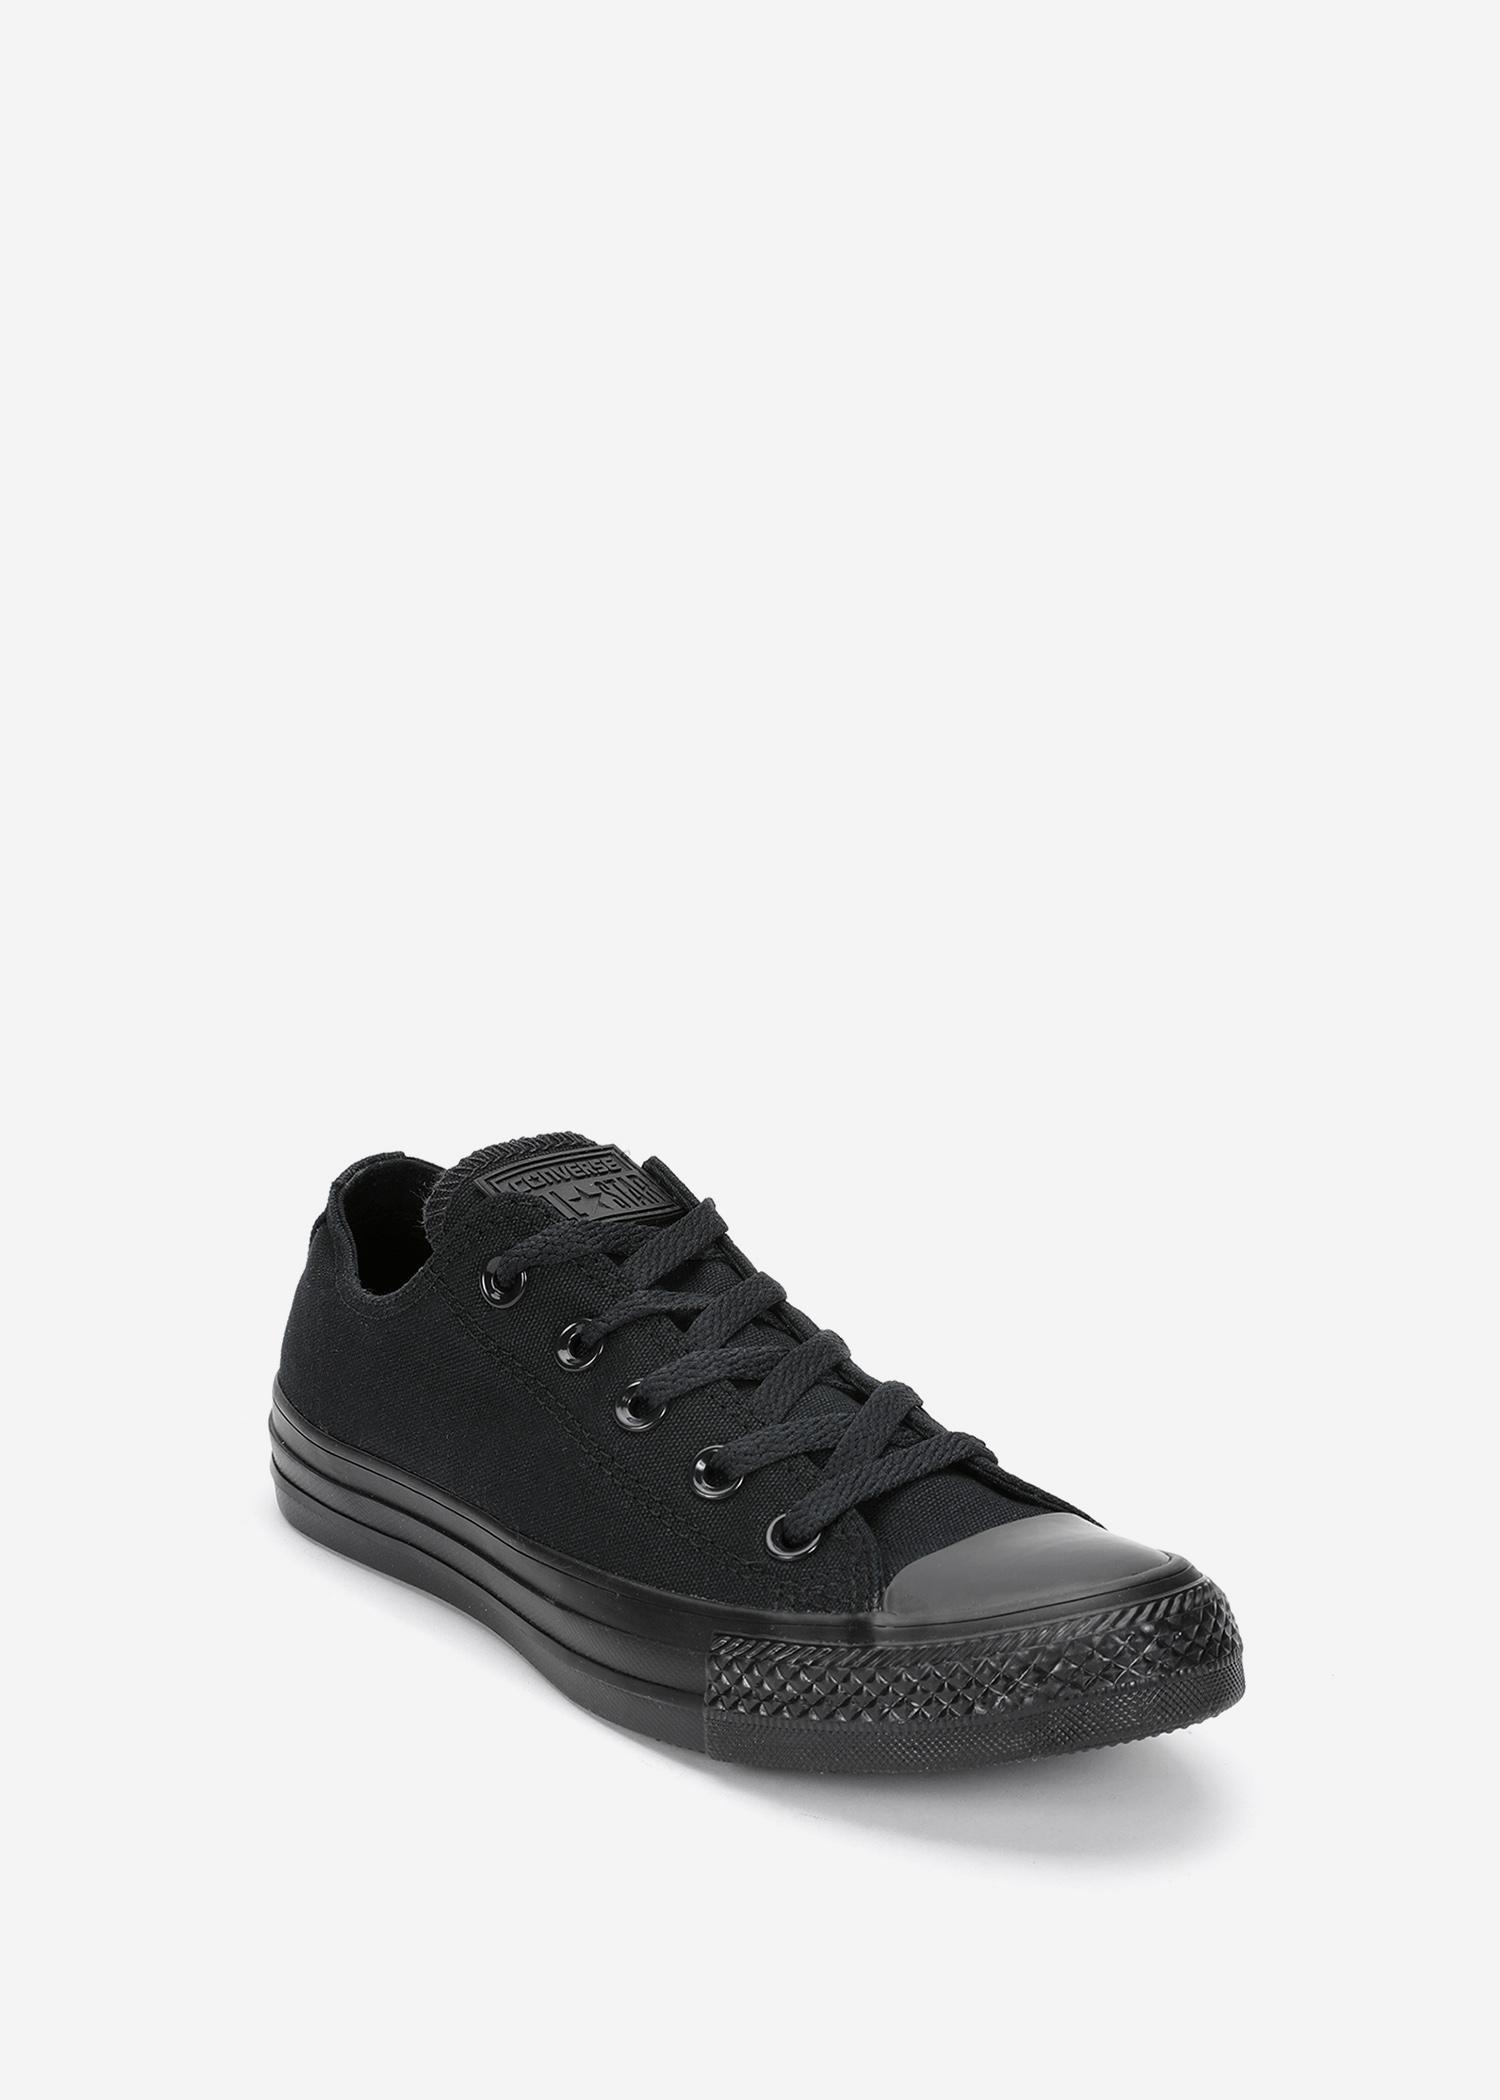 972126269c9f8c Converse Chuck Taylor All Star Core Shoes Black Monochrome - Style ...